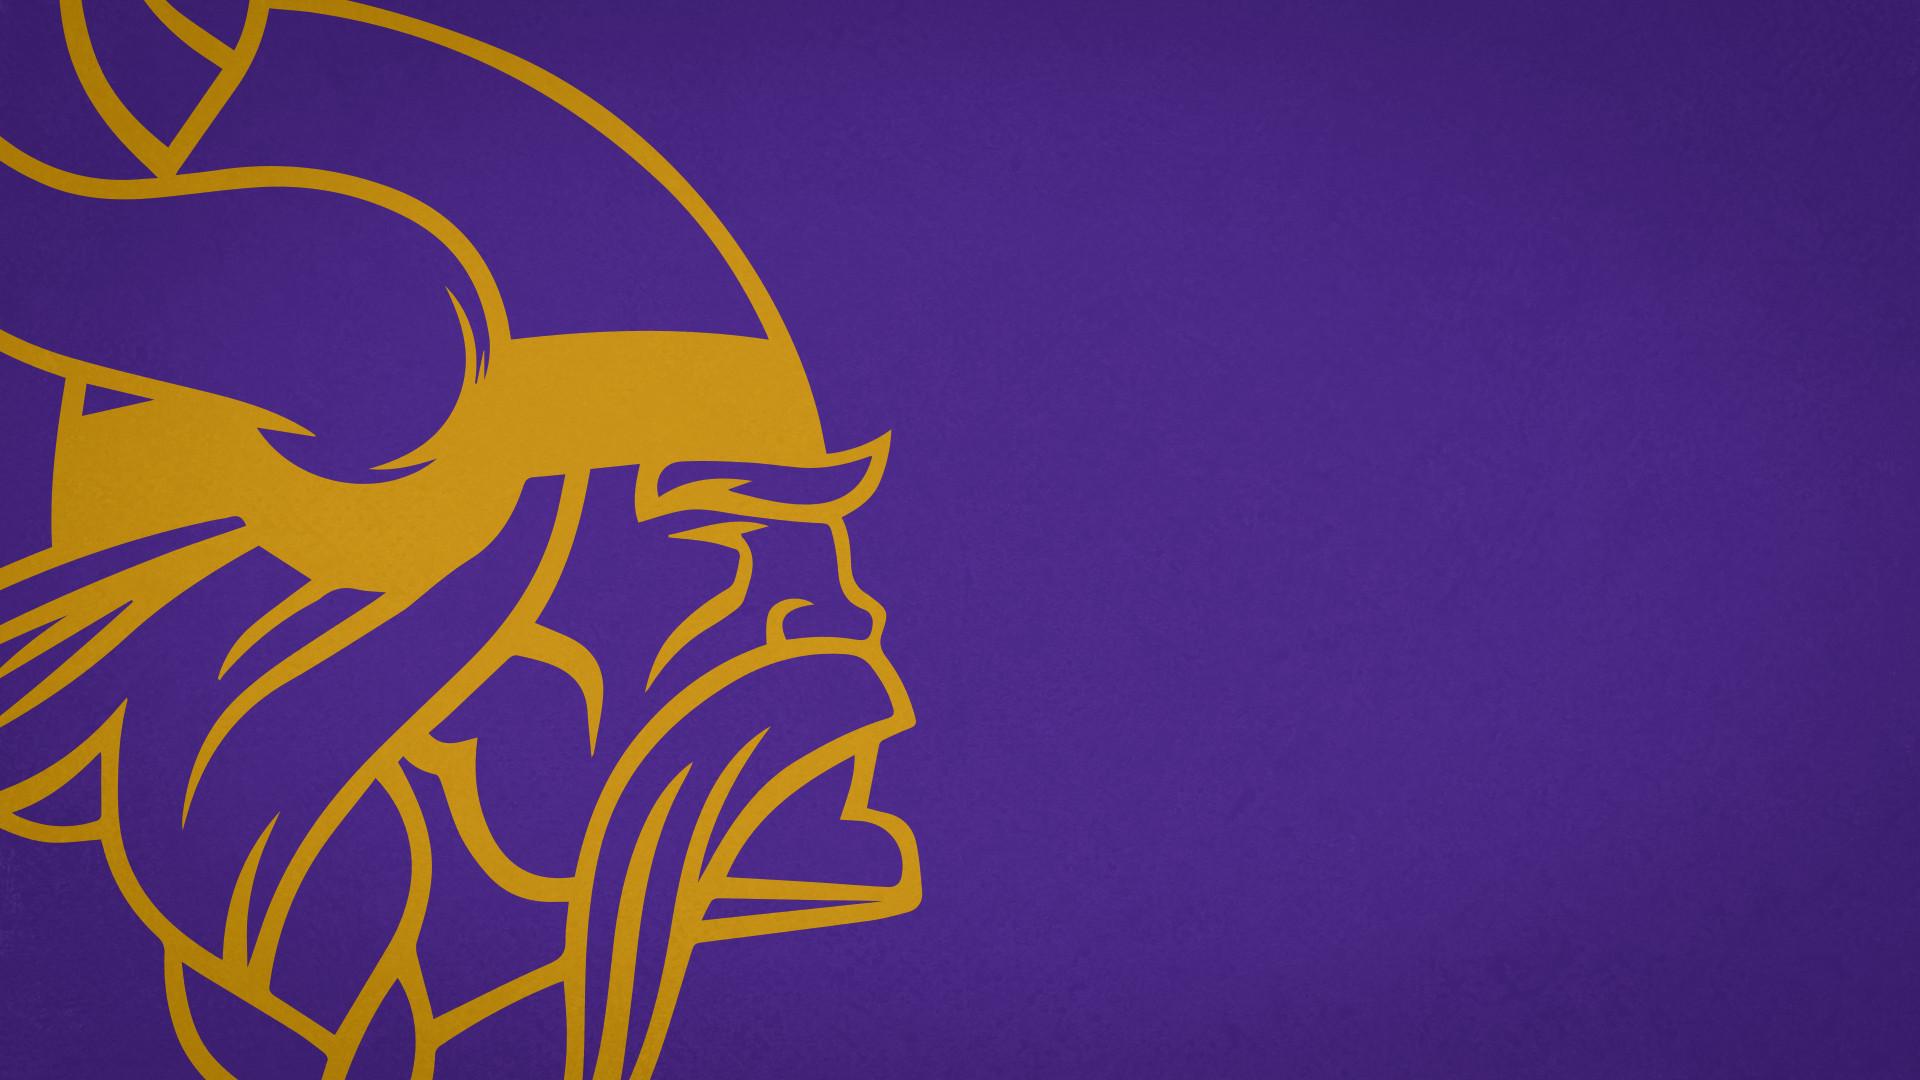 Minnesota Vikings Wallpapers 1